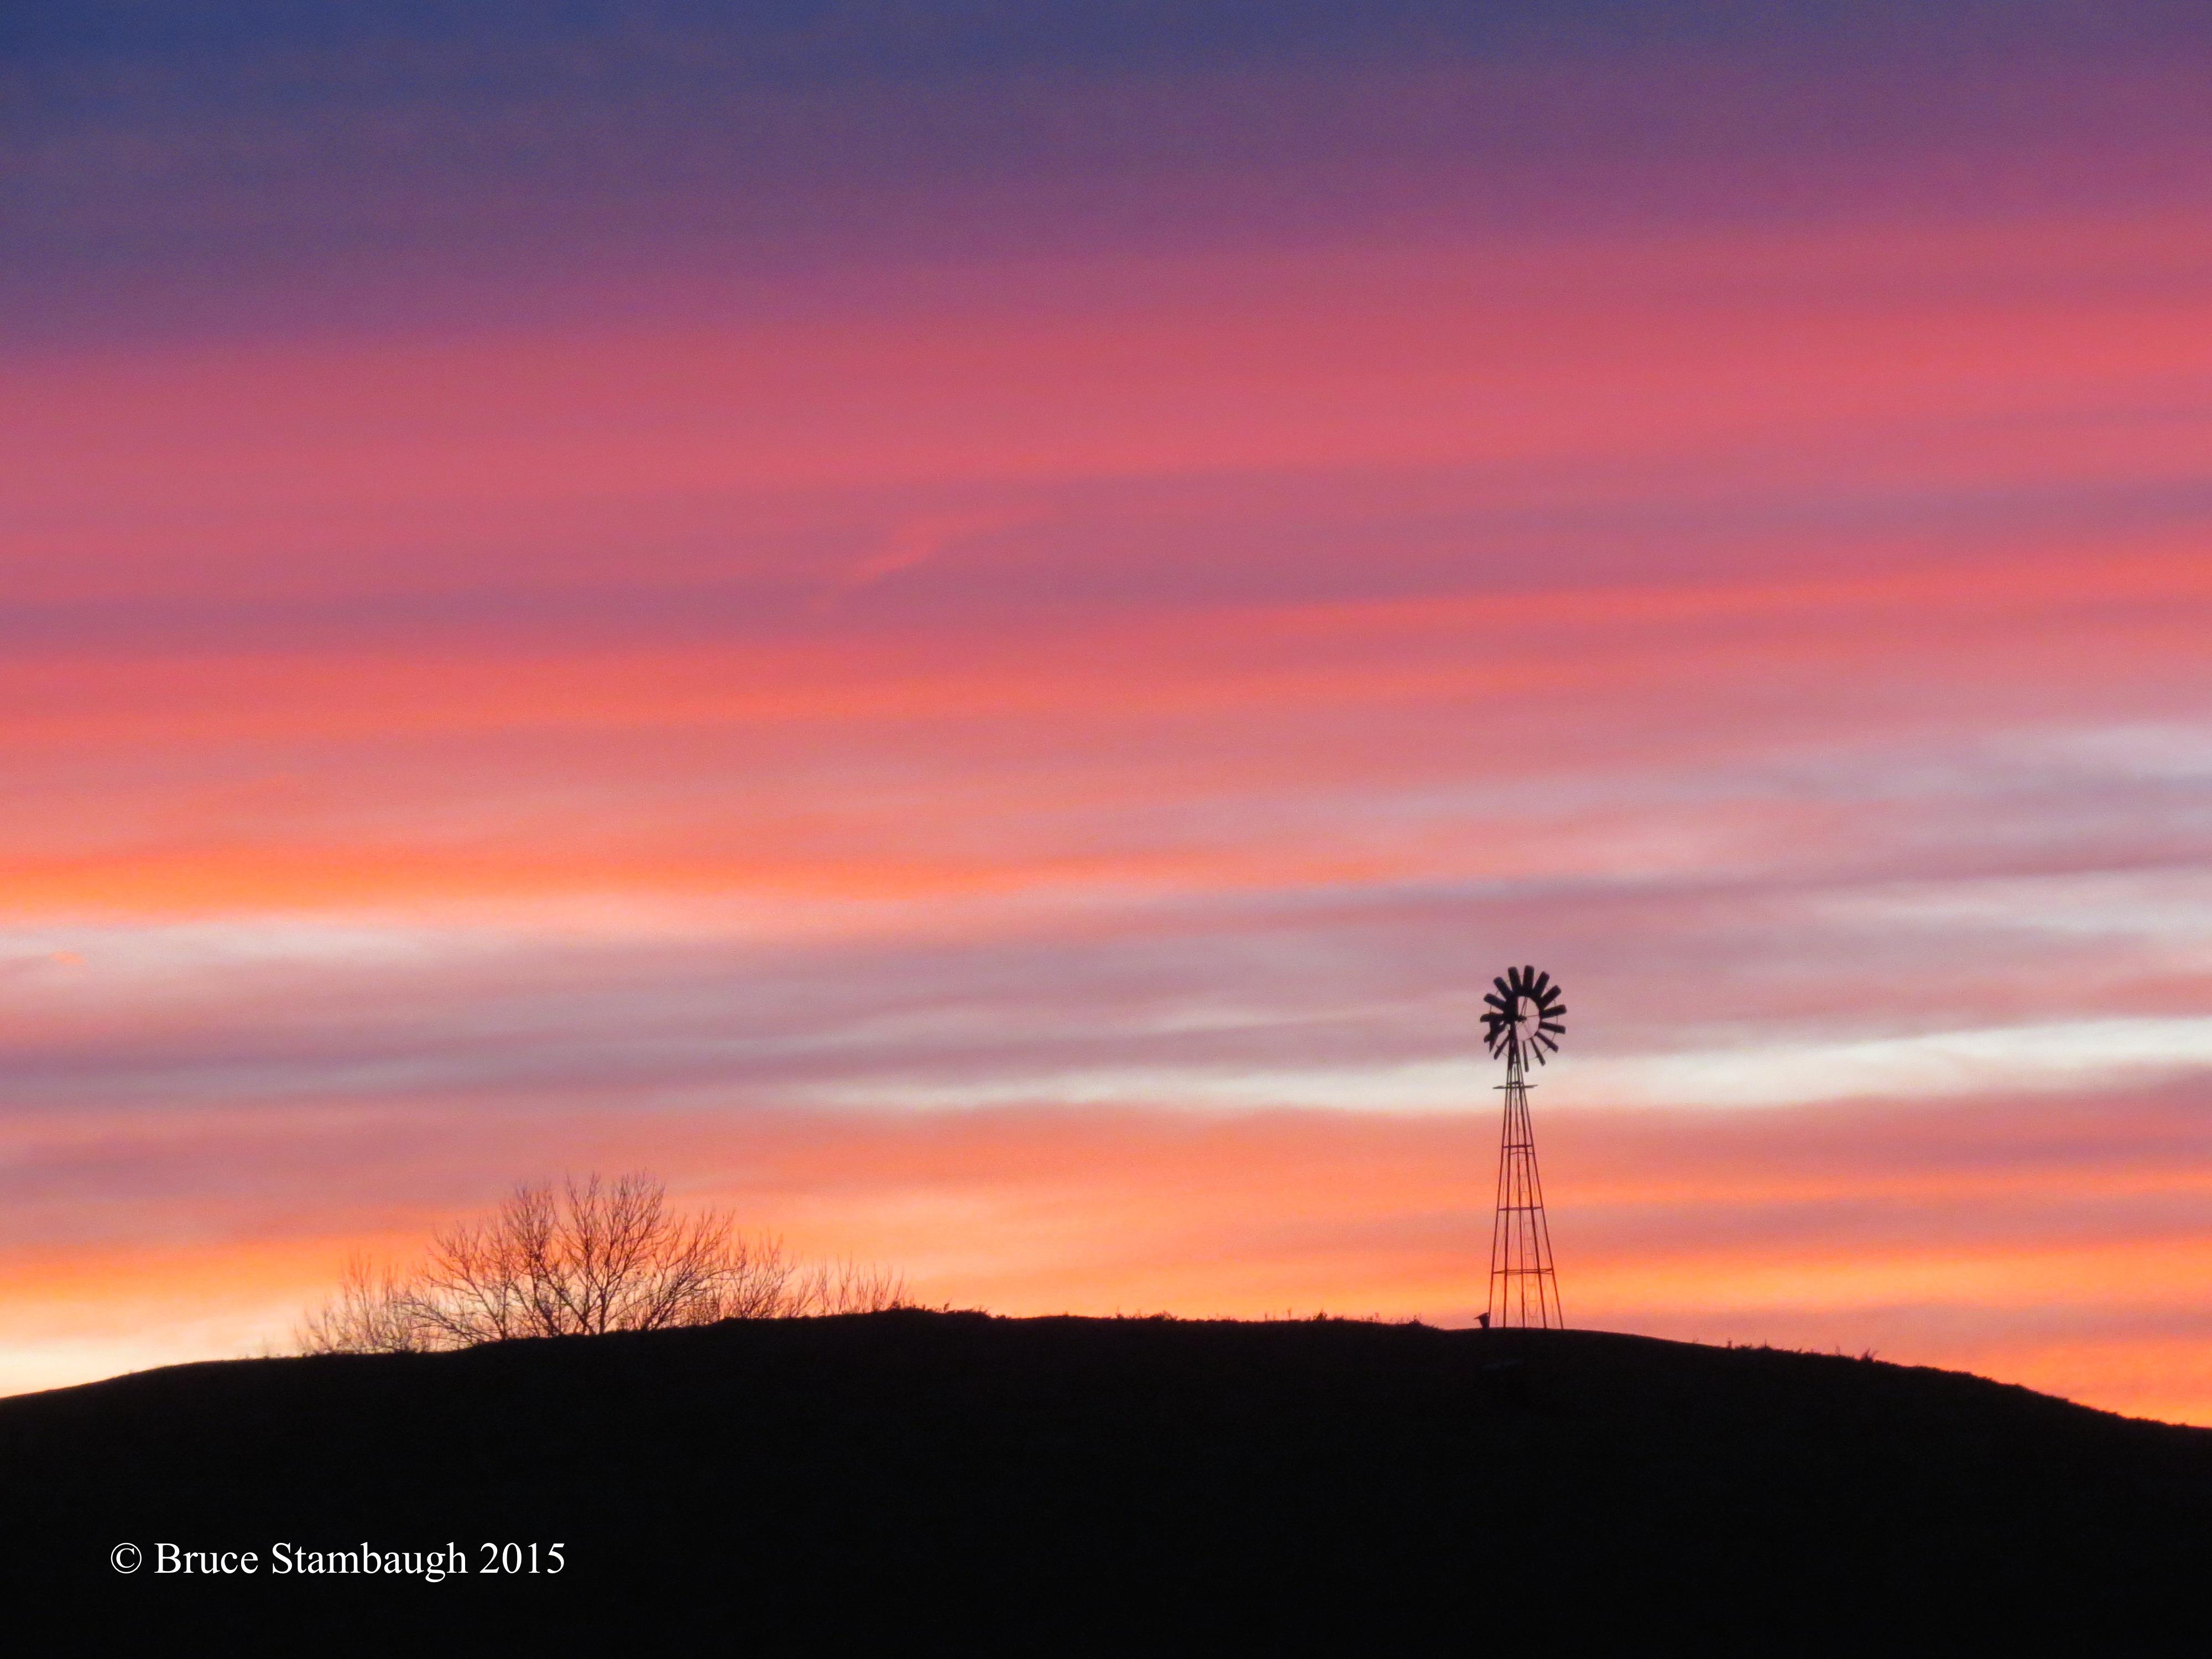 November sunset, windmill